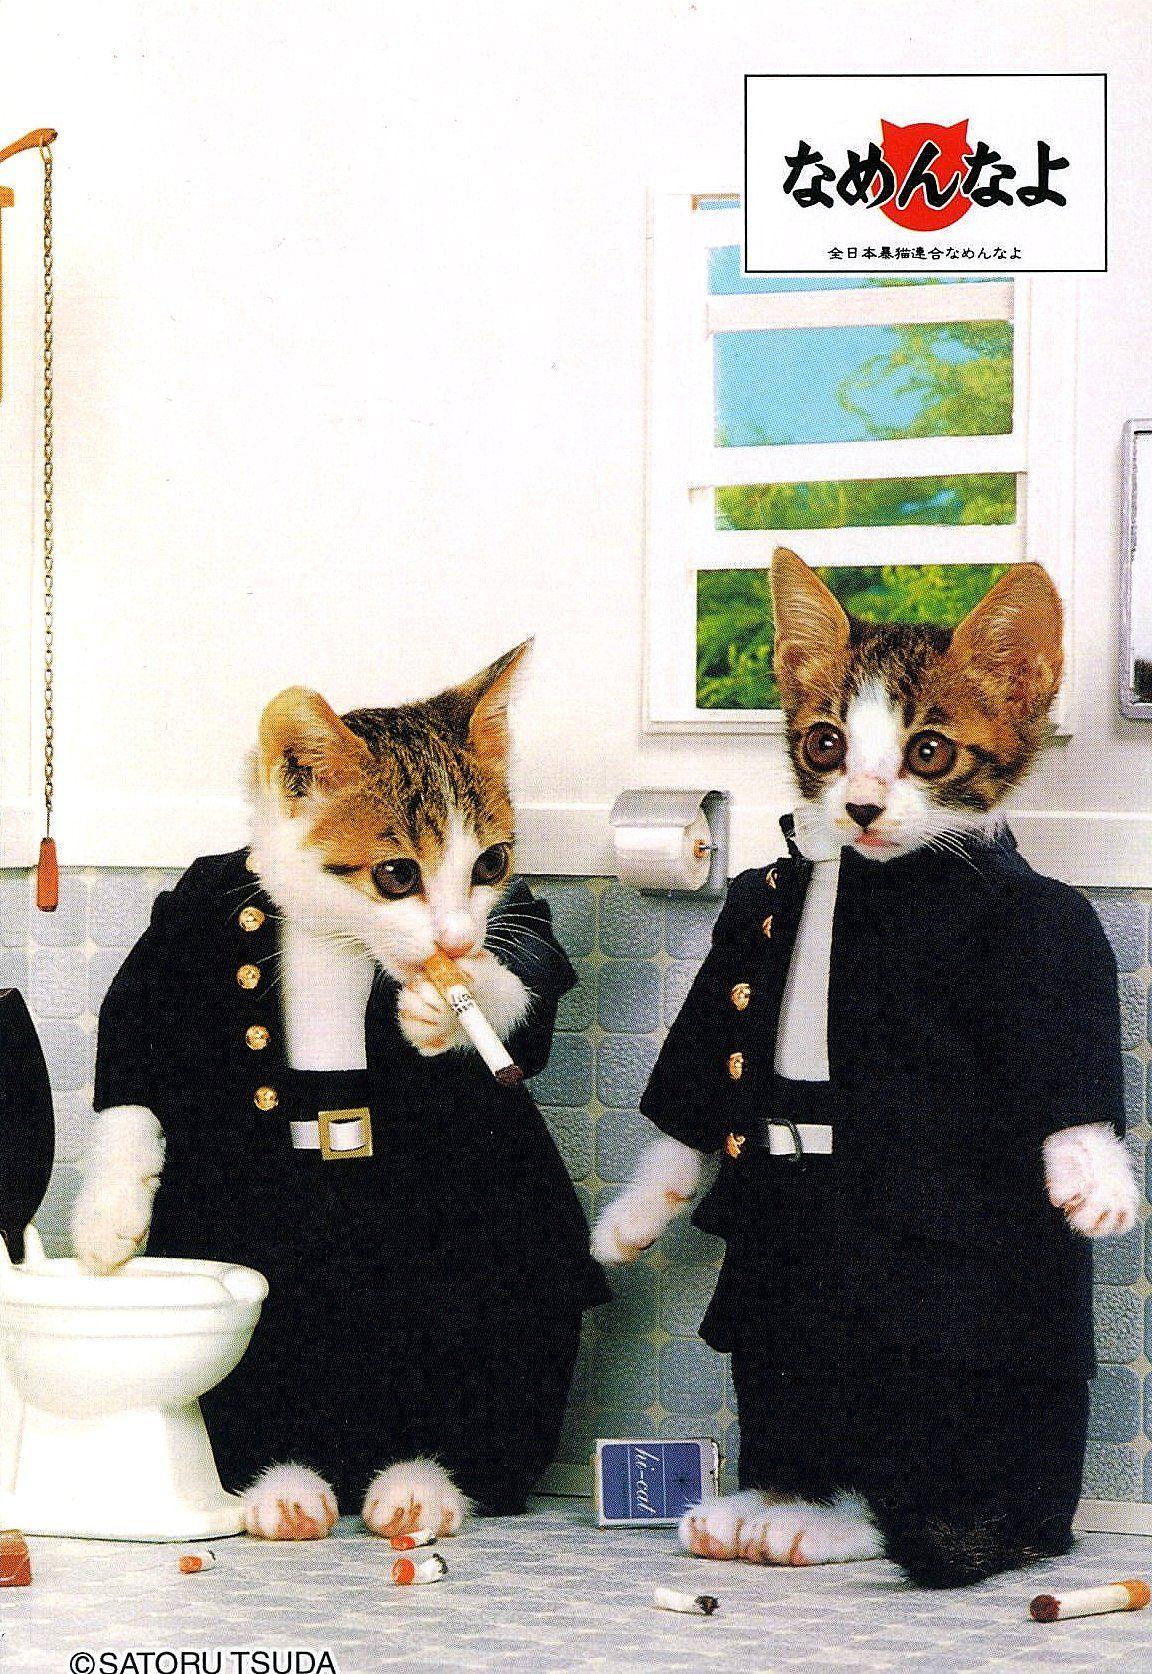 Rock N Roll Kitties Remembering The Nameneko Japanese Kitten Videos That Were A Night Flight Favorite Cats Kitten Gif Japanese Embroidery